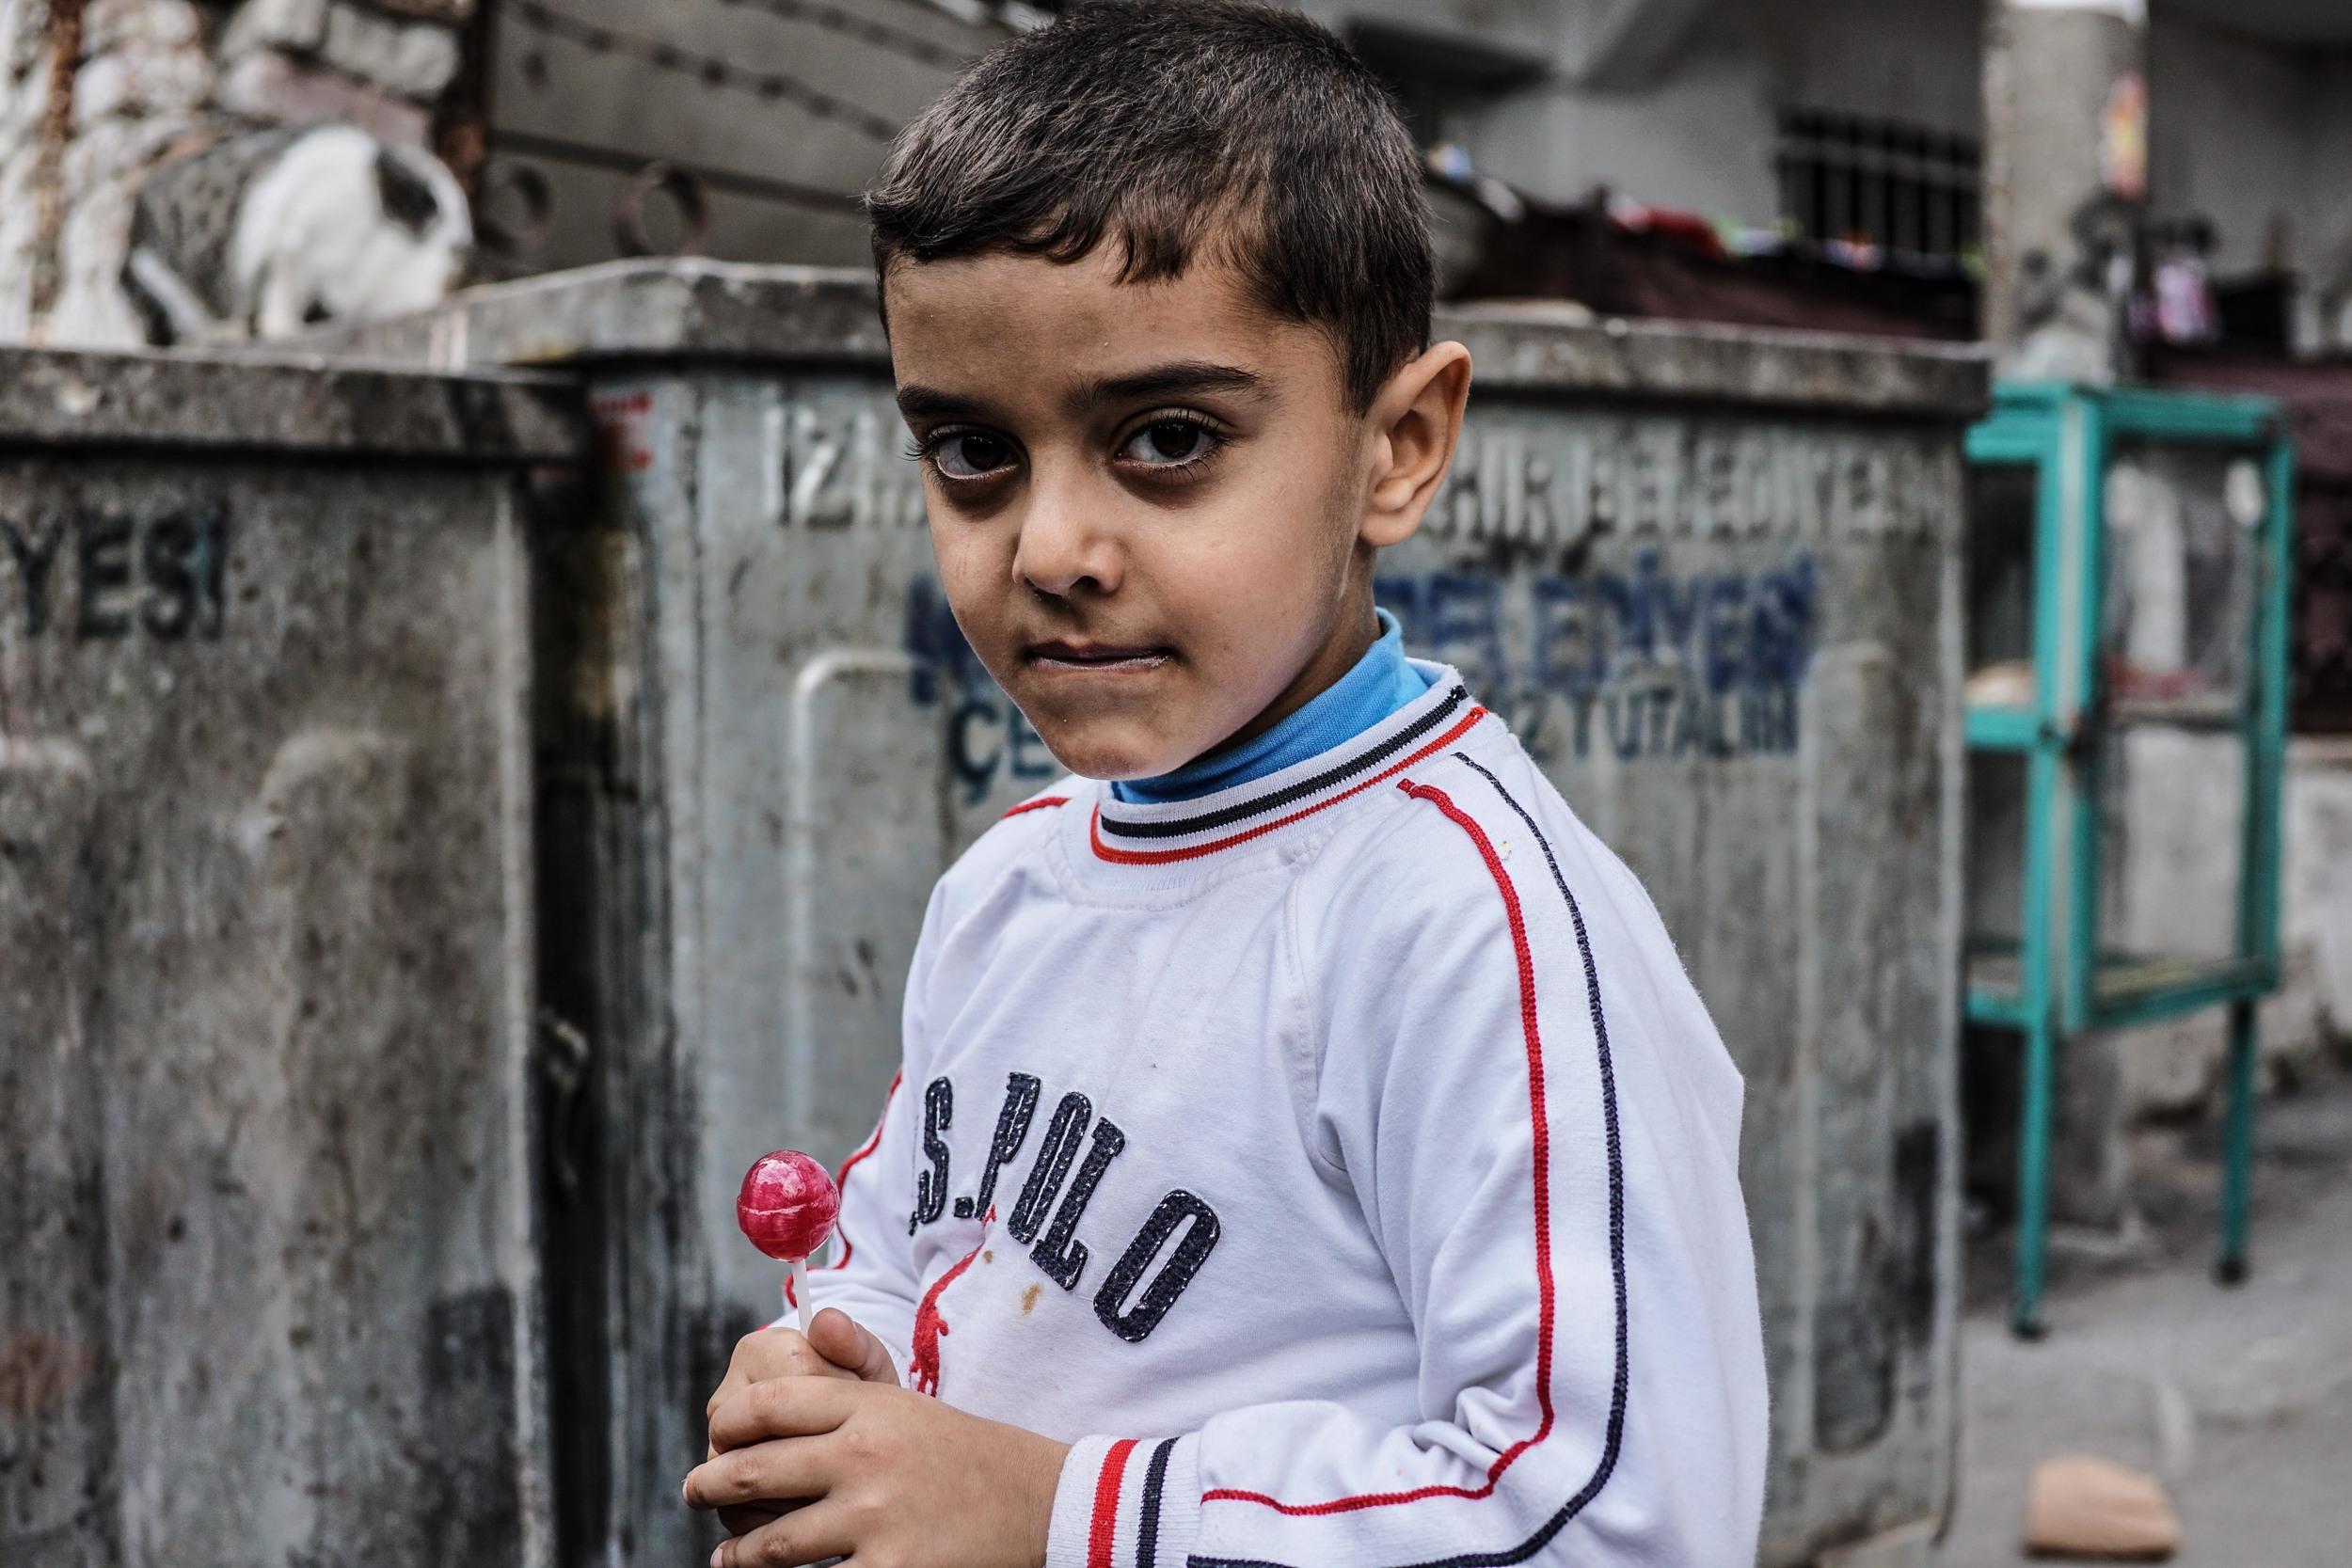 Syrian Refugee Crisis Izmir November 2015 3.jpg